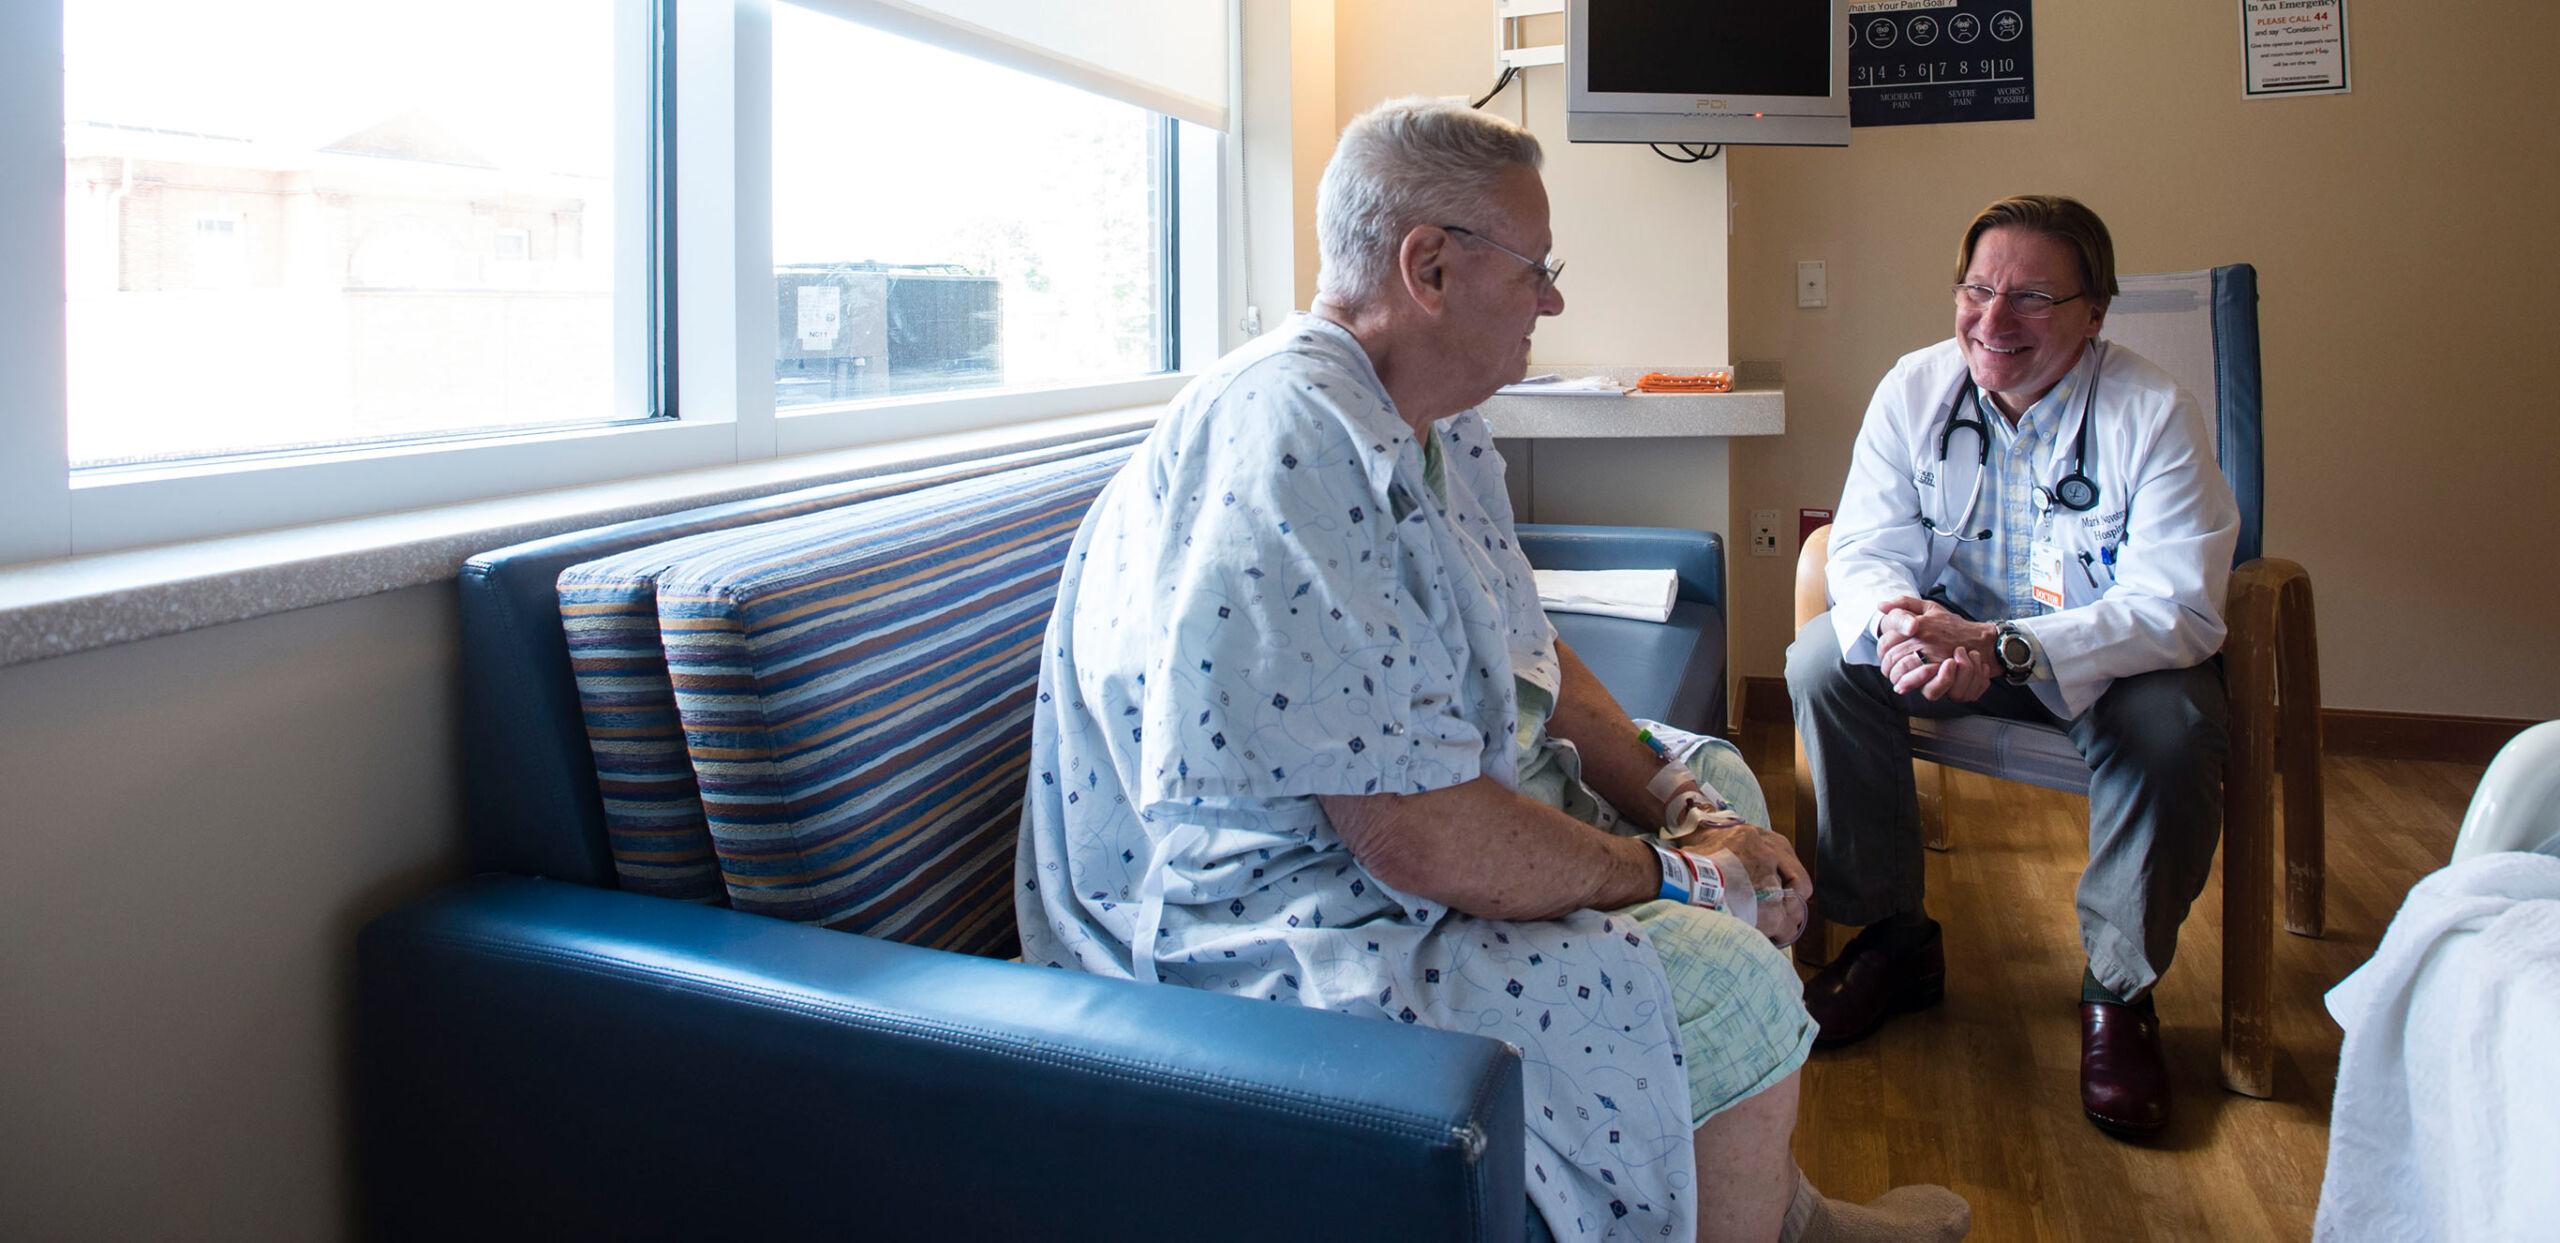 Hospitalist Mark Novotny, MD, talks with patient at Cooley Dickinson Hospital, Northampton, MA 01060